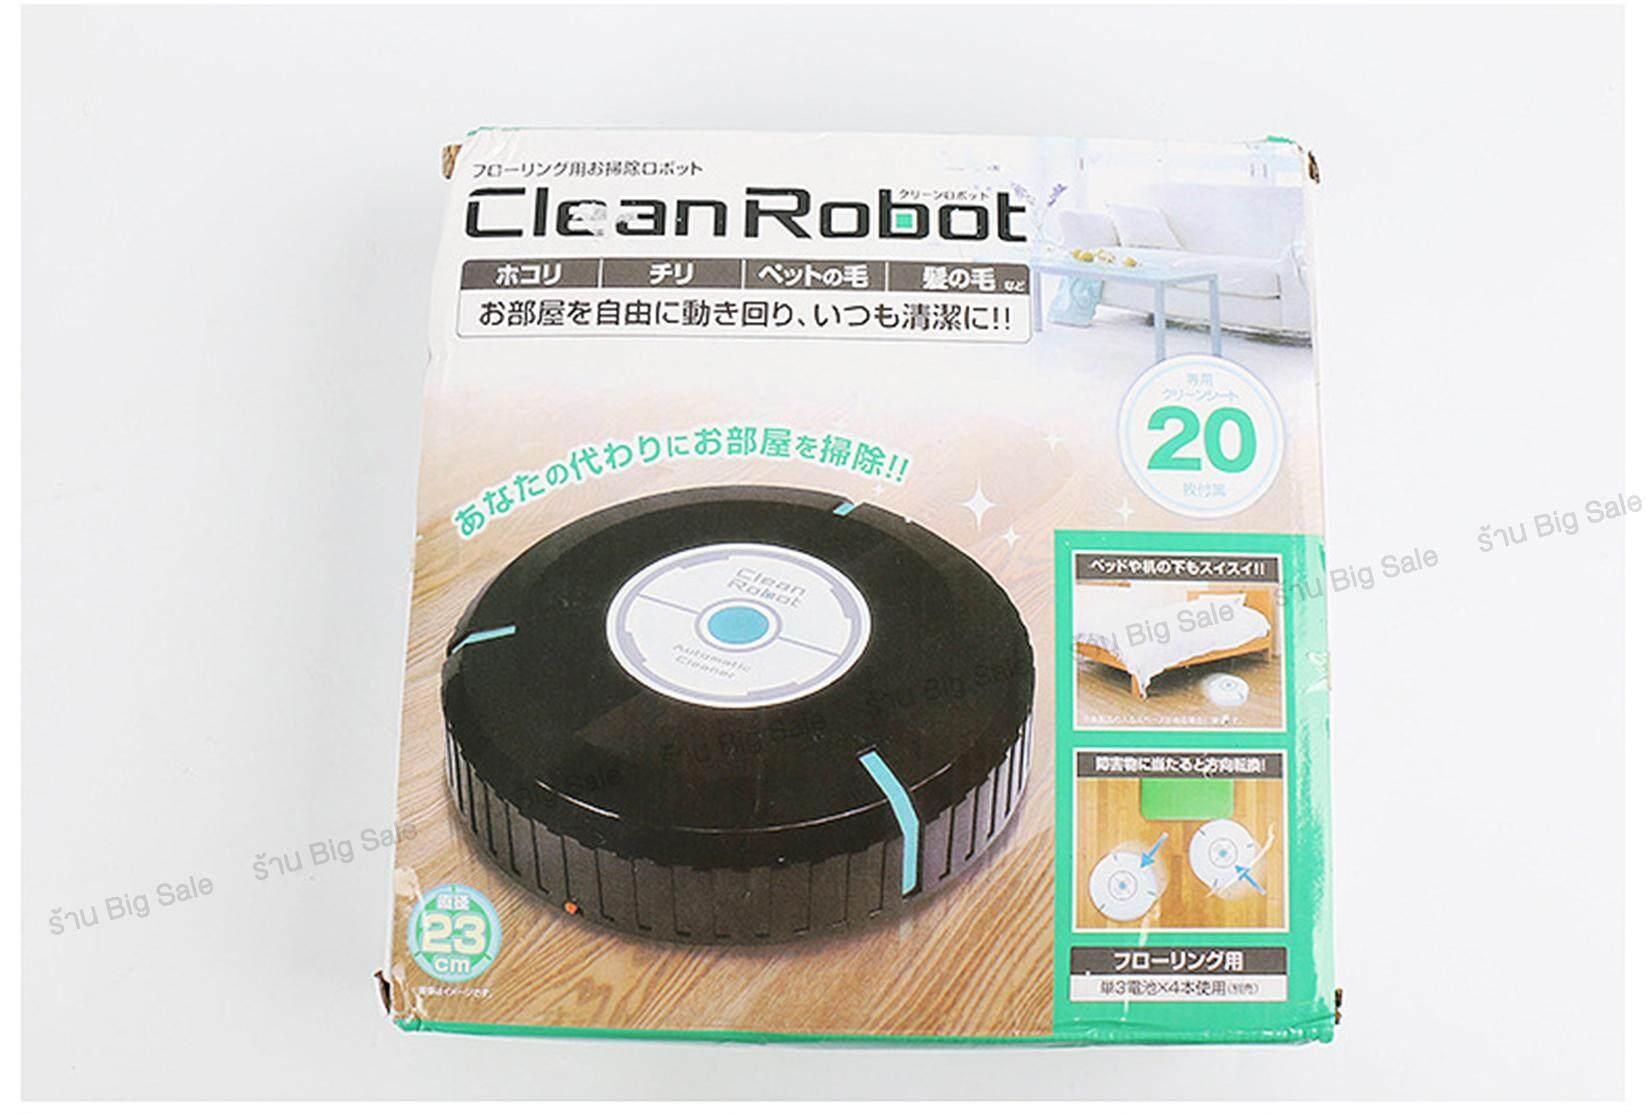 Sweeteye Shopหุ่นยนต์ดูดฝุ่น เครื่องดูดฝุ่นอัตโนมัติ ทำความสะอาดพื้น เครื่องดูดฝุ่นอัตโนมัติ เครื่องทำความสะอาด